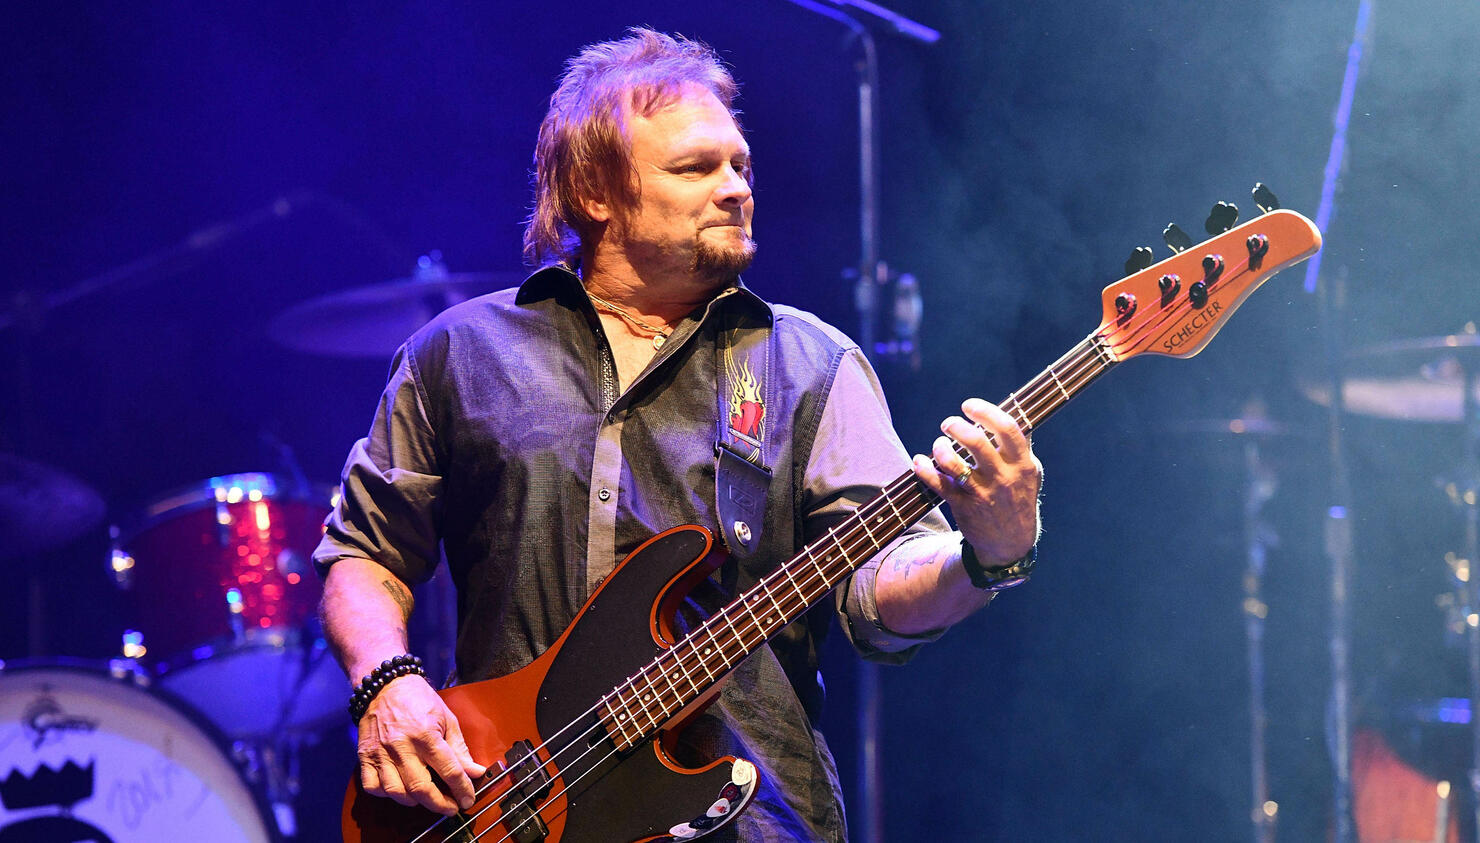 Michael Anthony Downplays Van Halen Reunion Rumors